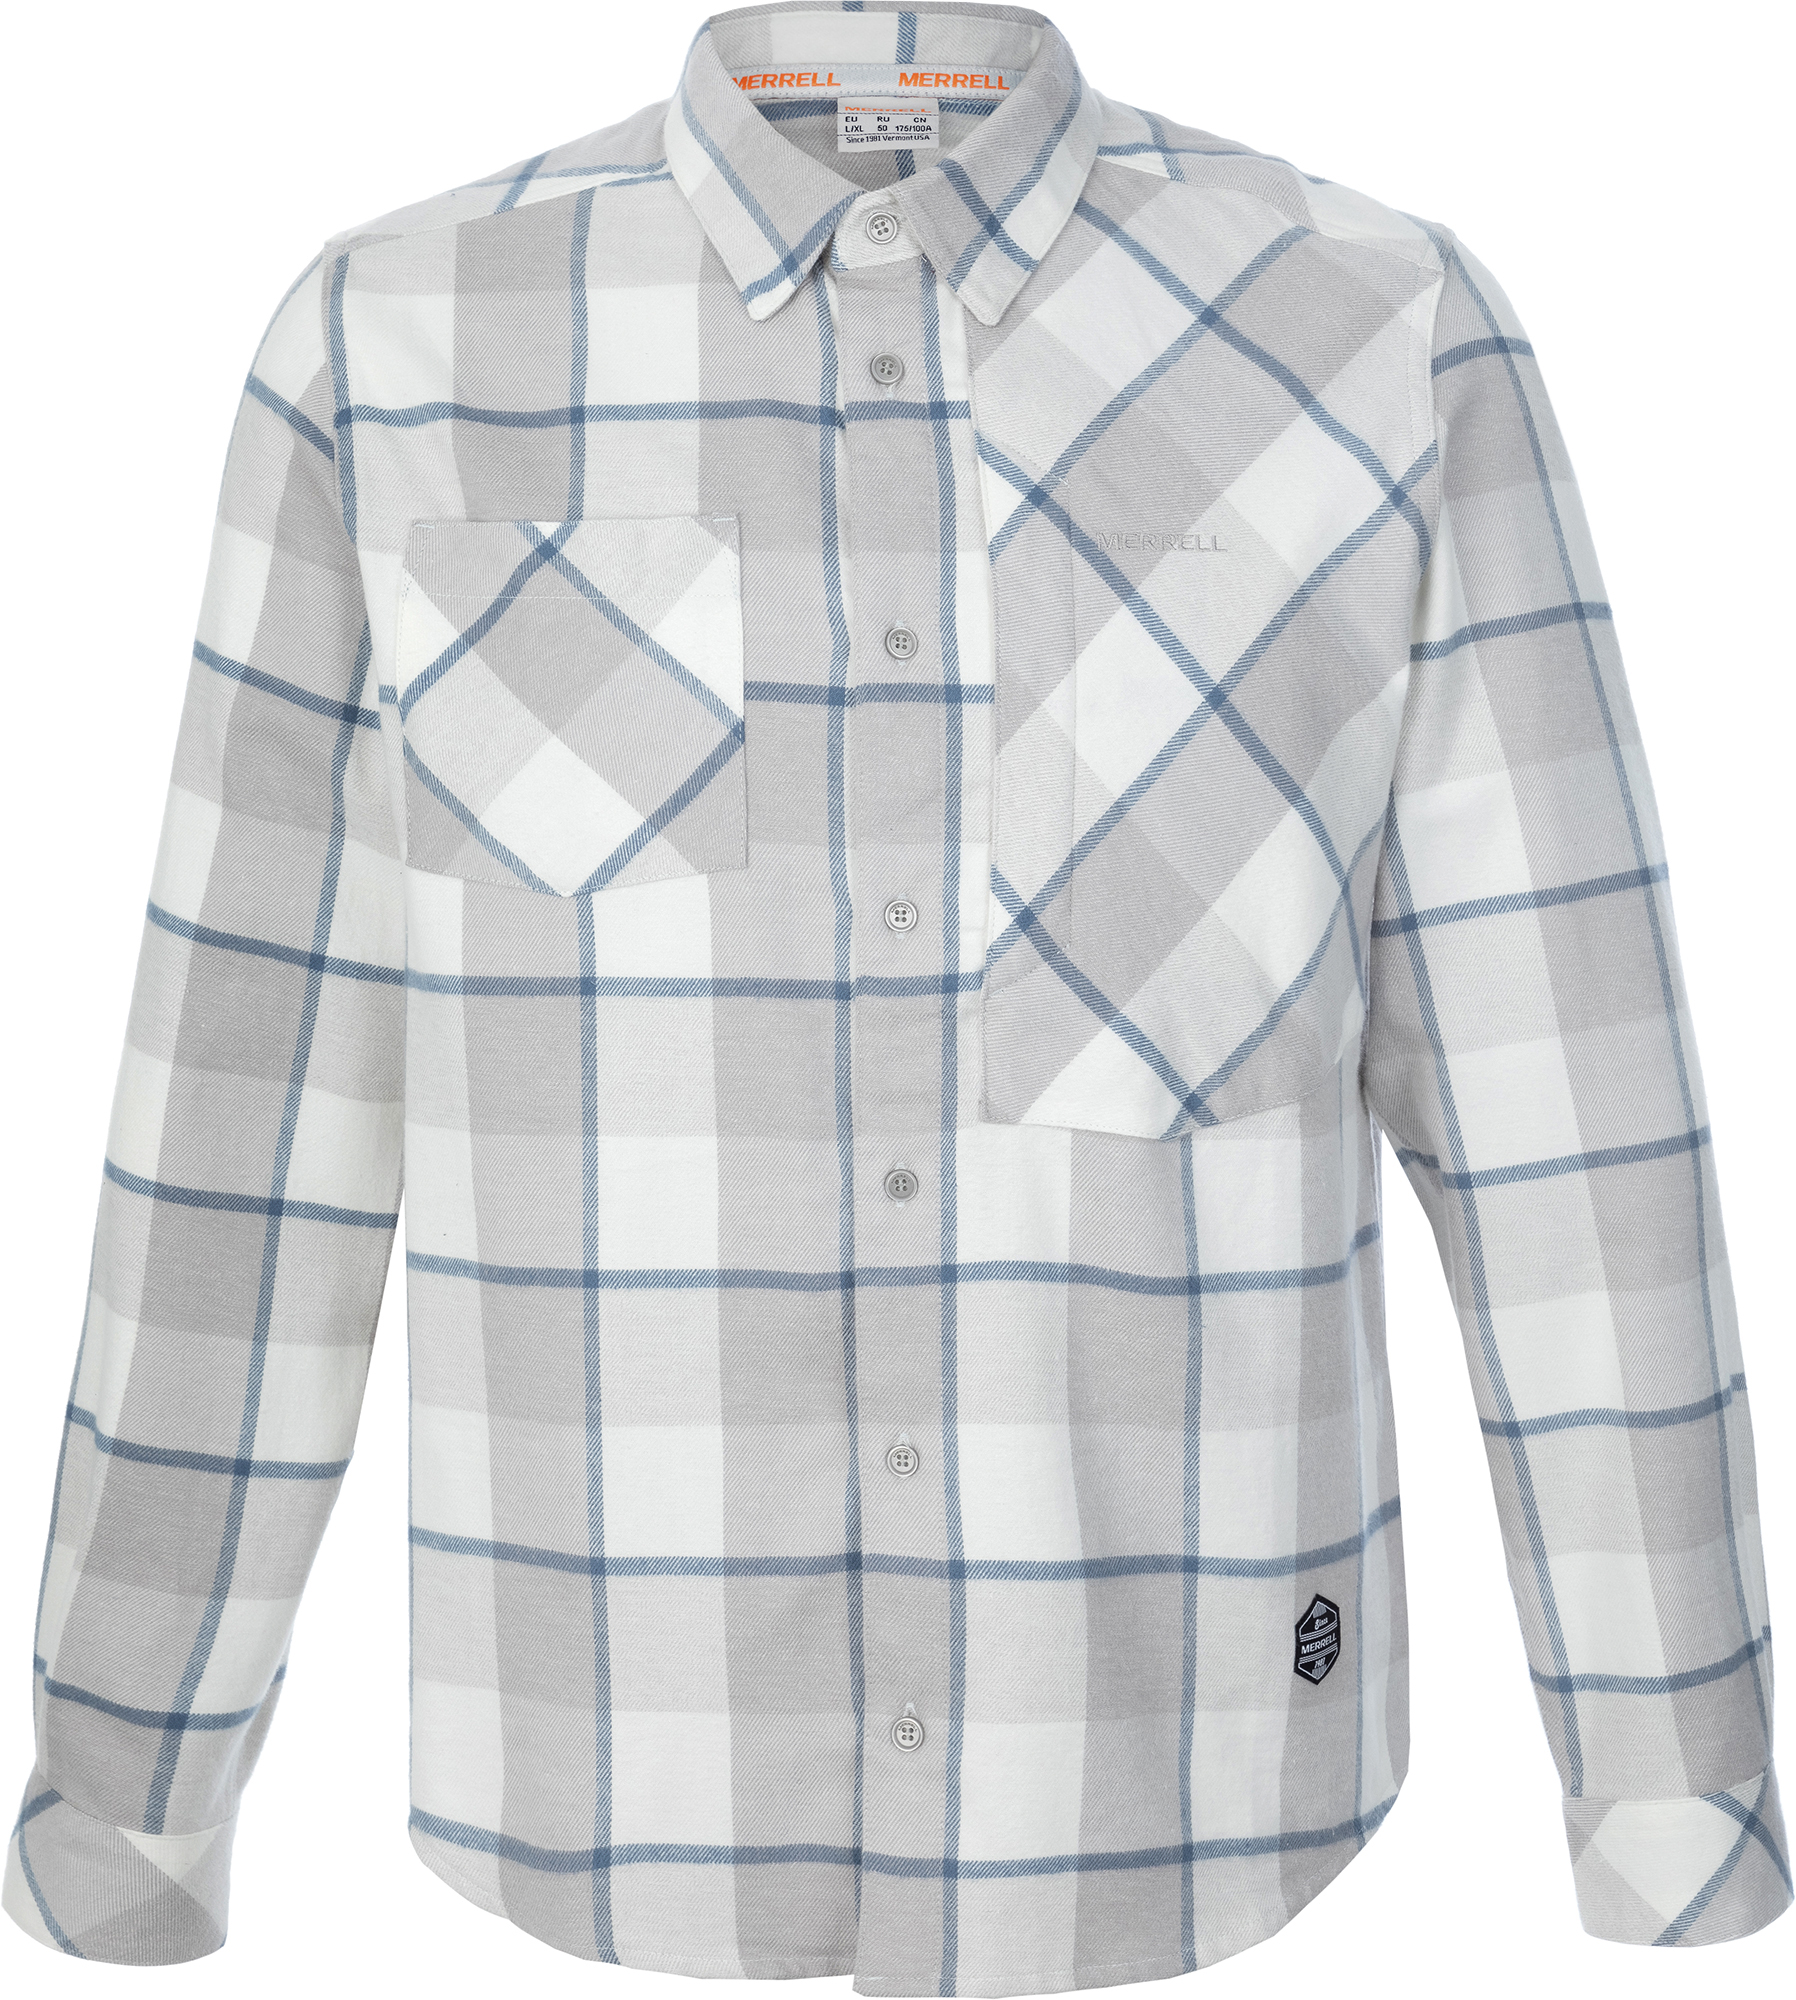 Merrell Рубашка мужская Merrell, размер 56 цена